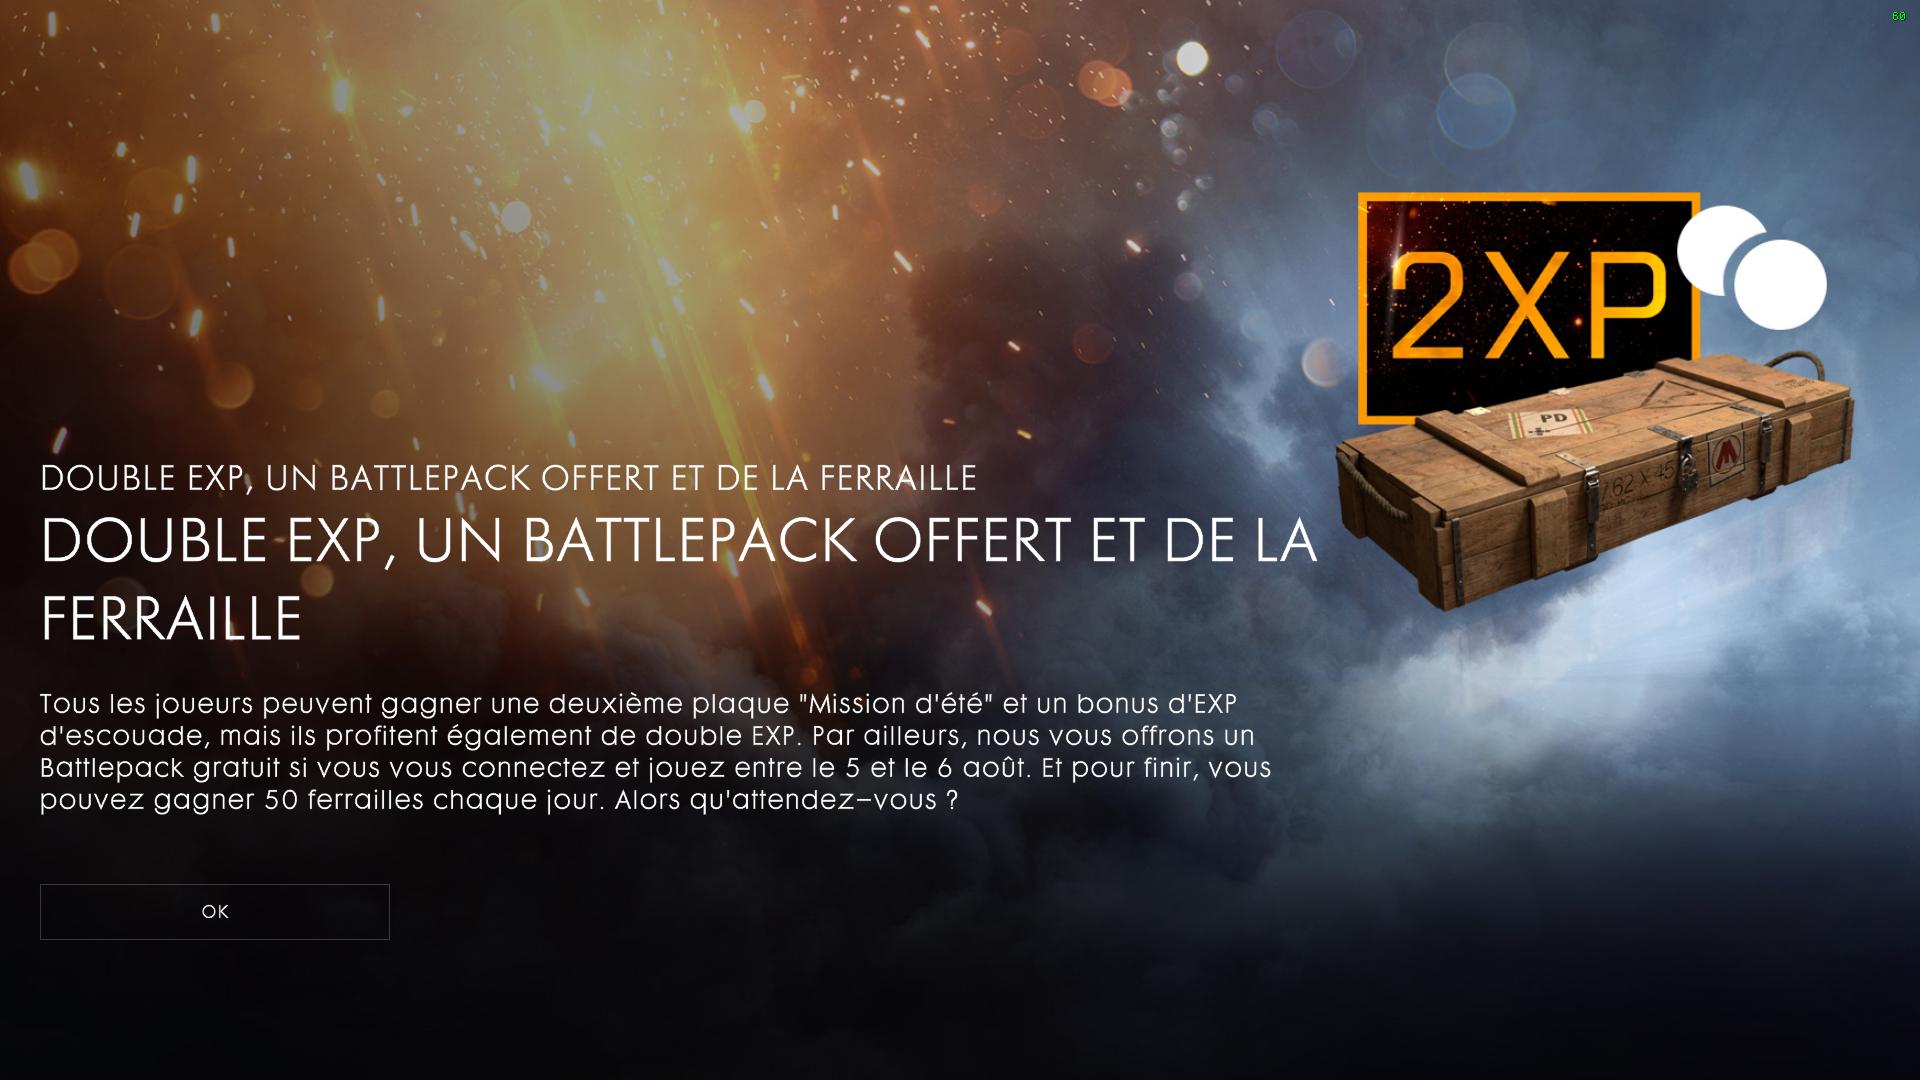 Kostenloses Battlepack + doppelte XP bei [Battlefield 1 & Battlefield 4] vom 05.-06.08.